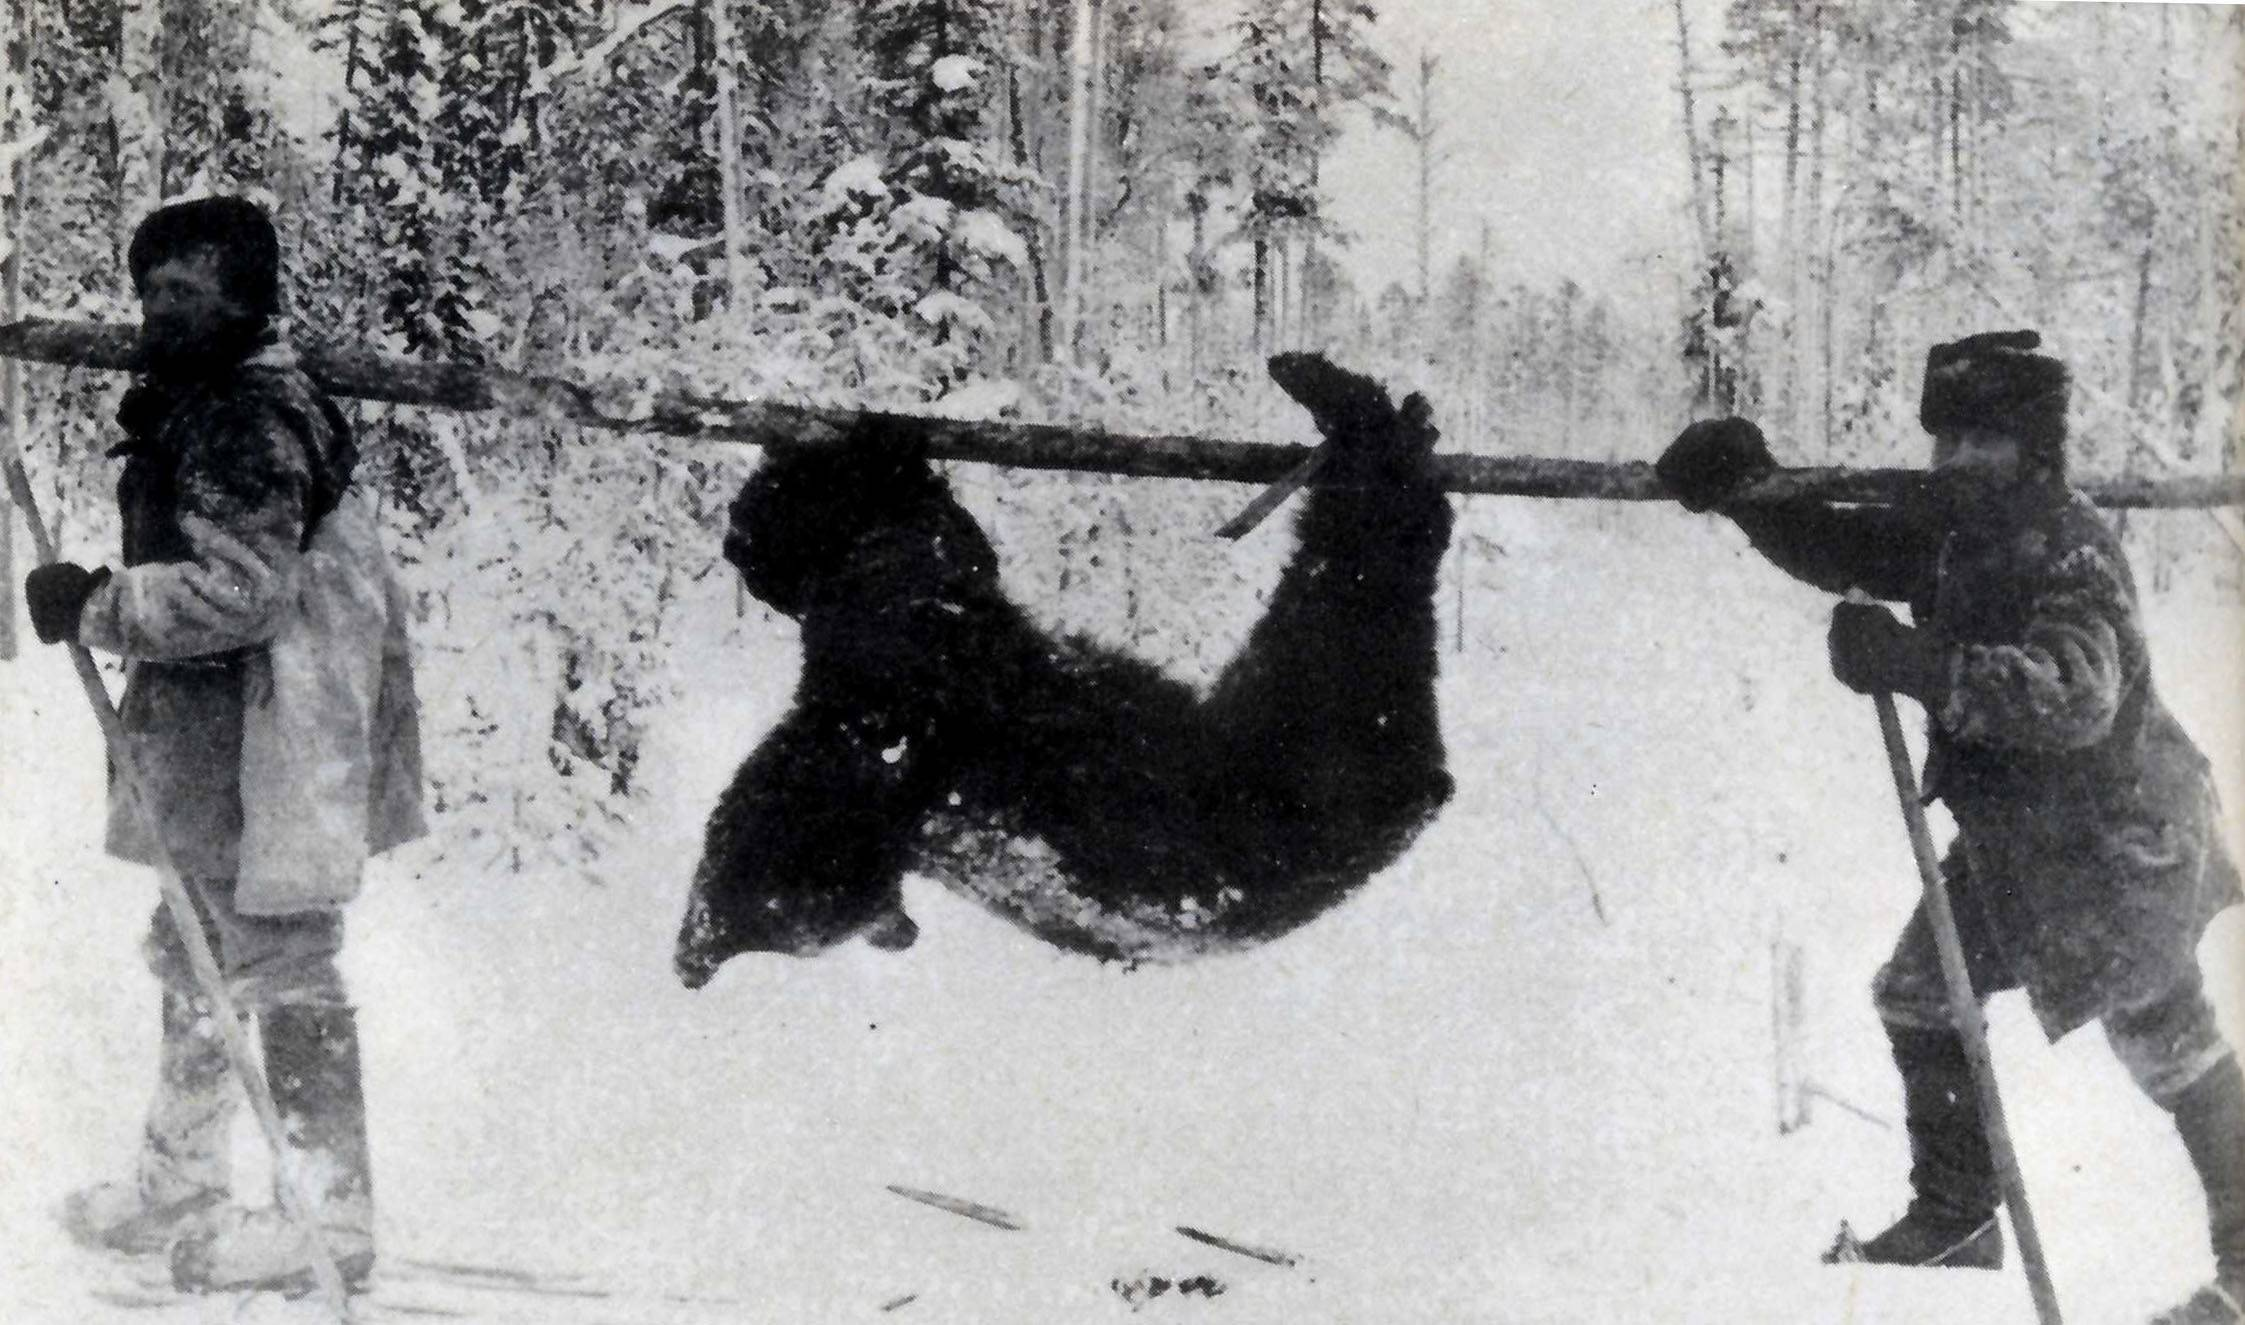 Рогатина для охоты на медведя – просто и эффективно